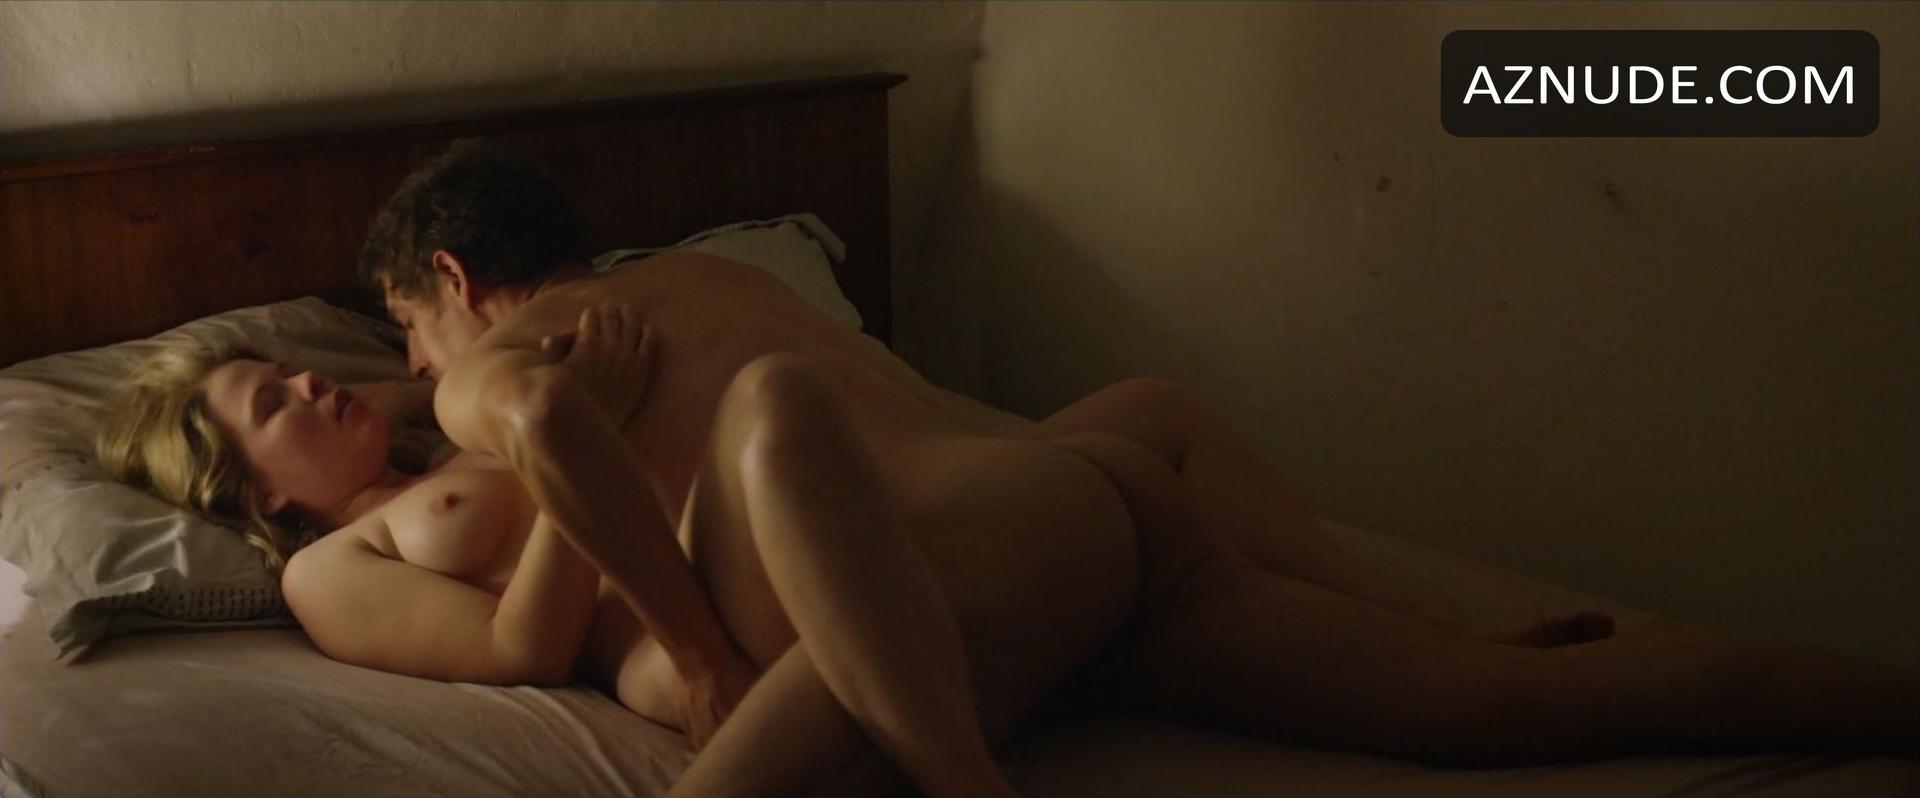 Marrisa tomei sex scene - 1 part 2